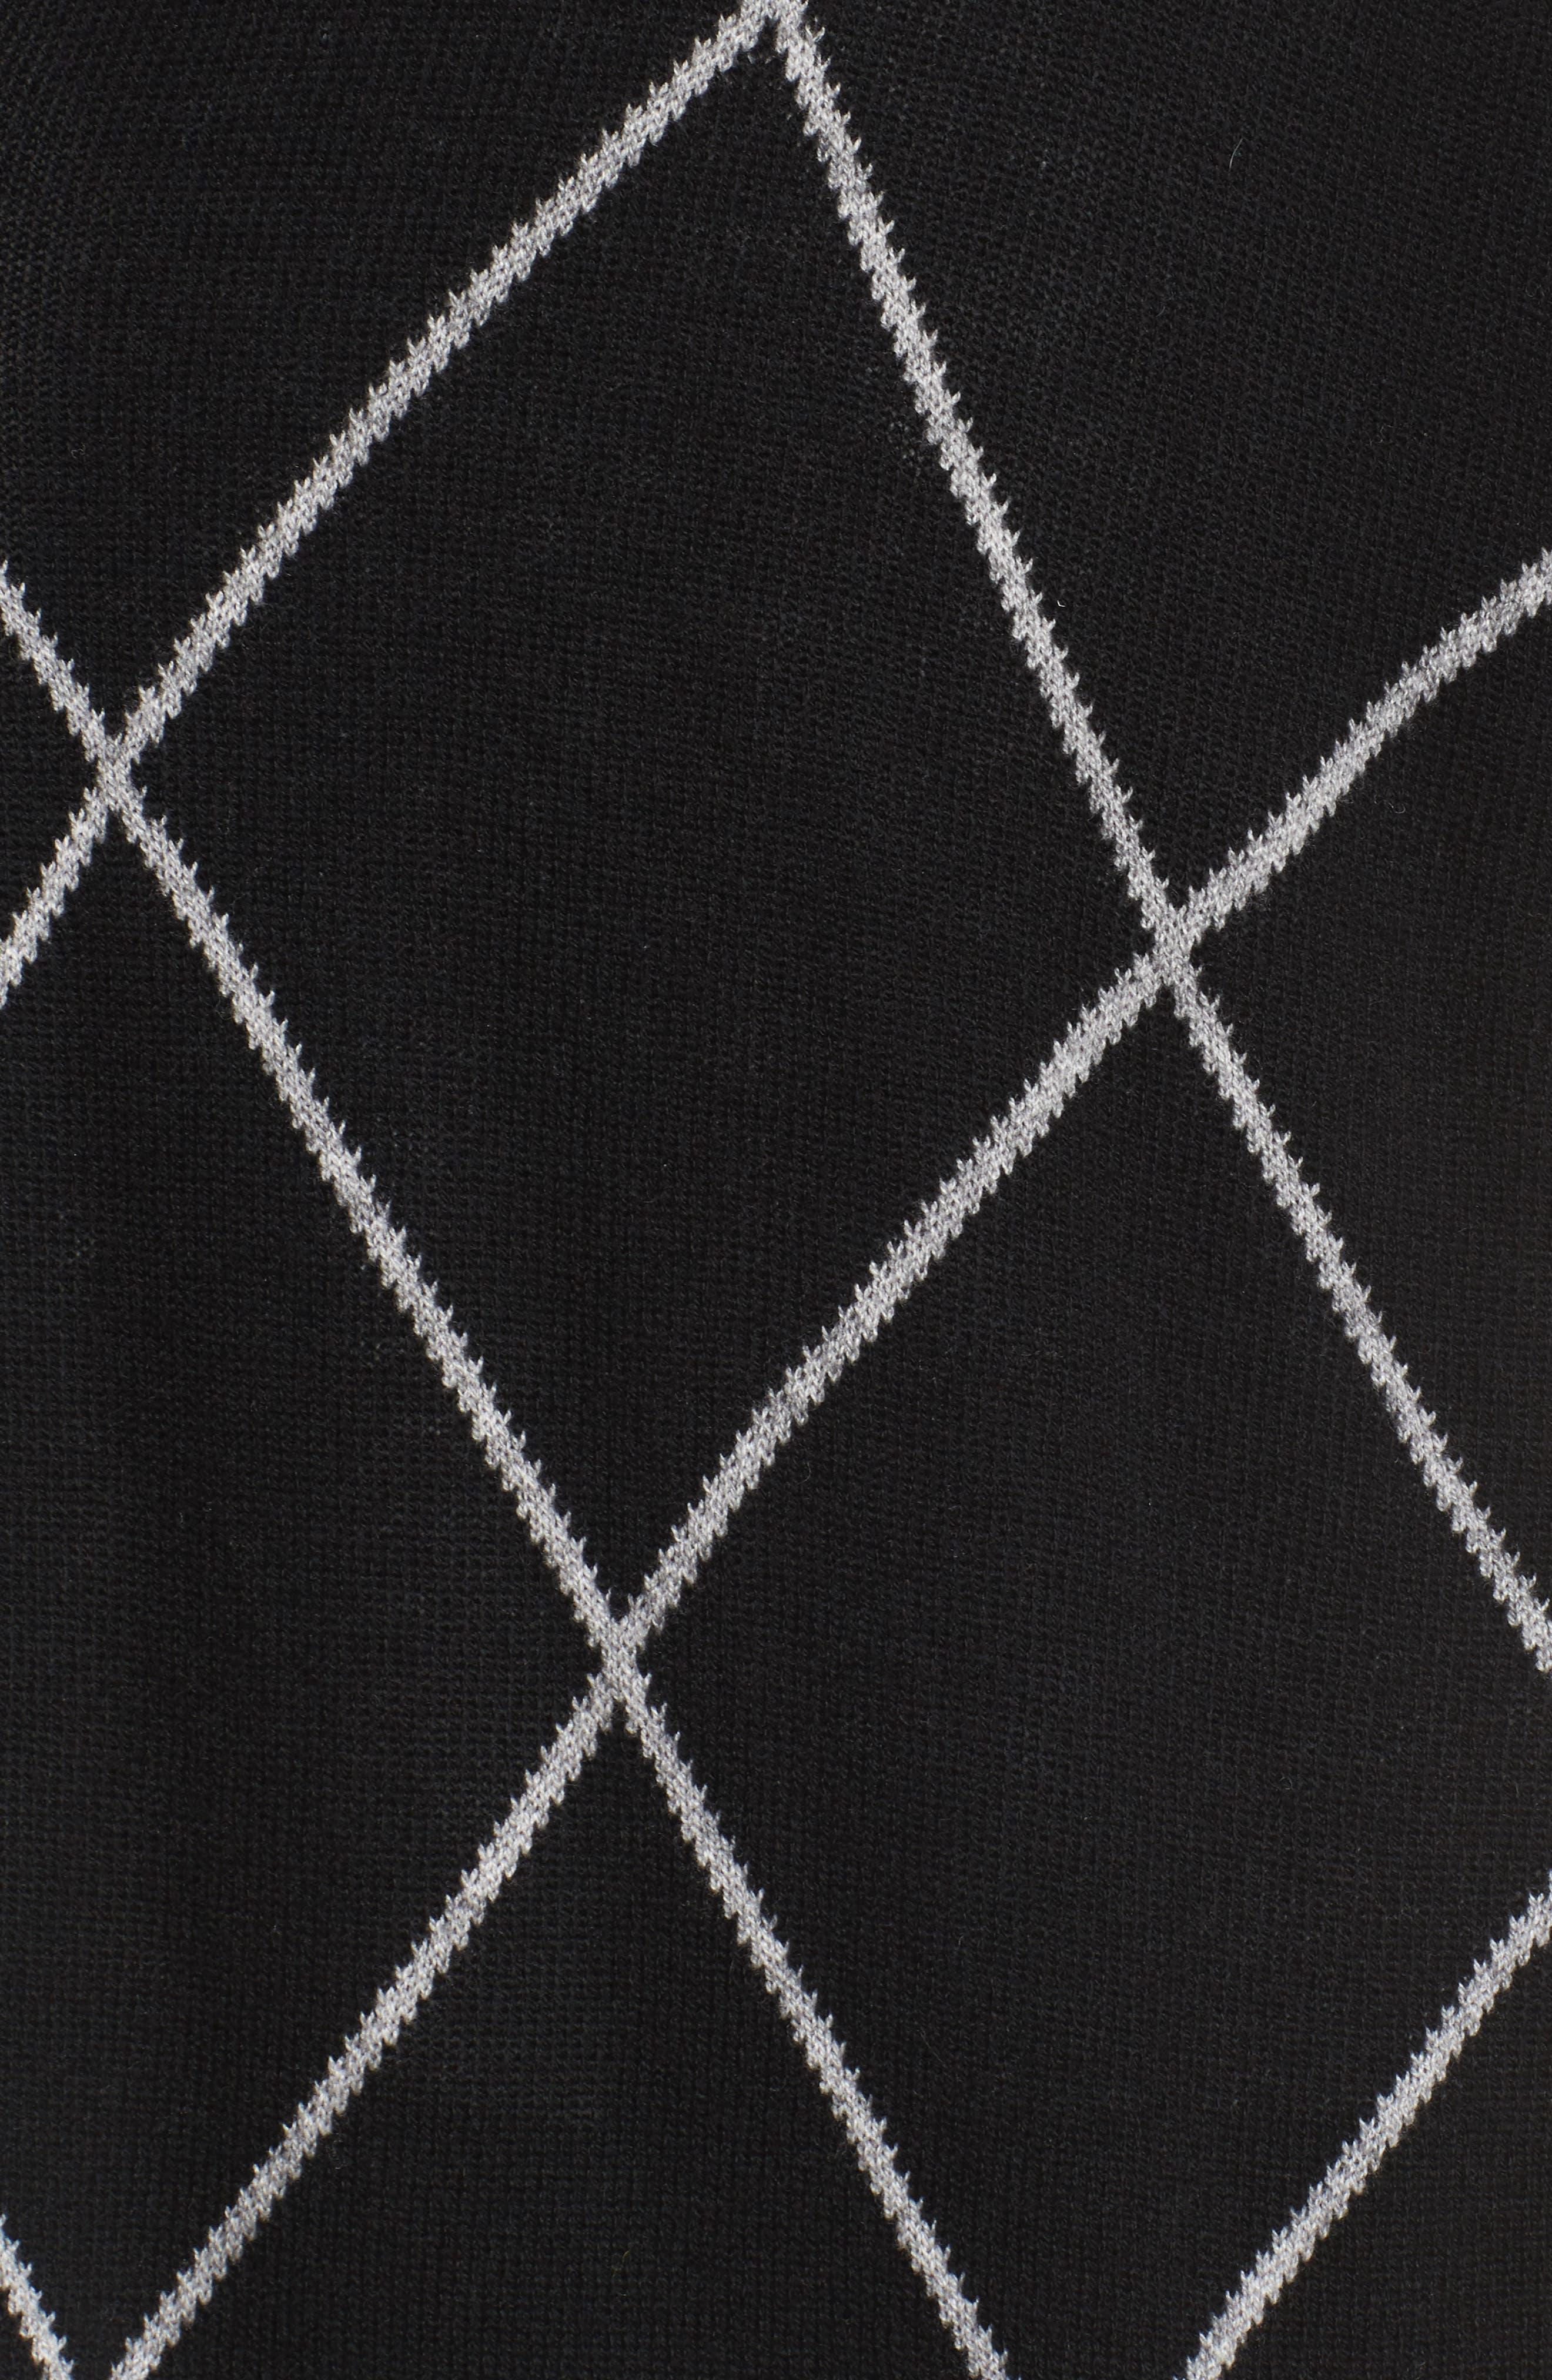 Windowpane Wool & Cashmere Cardigan,                             Alternate thumbnail 6, color,                             Black Windowpane